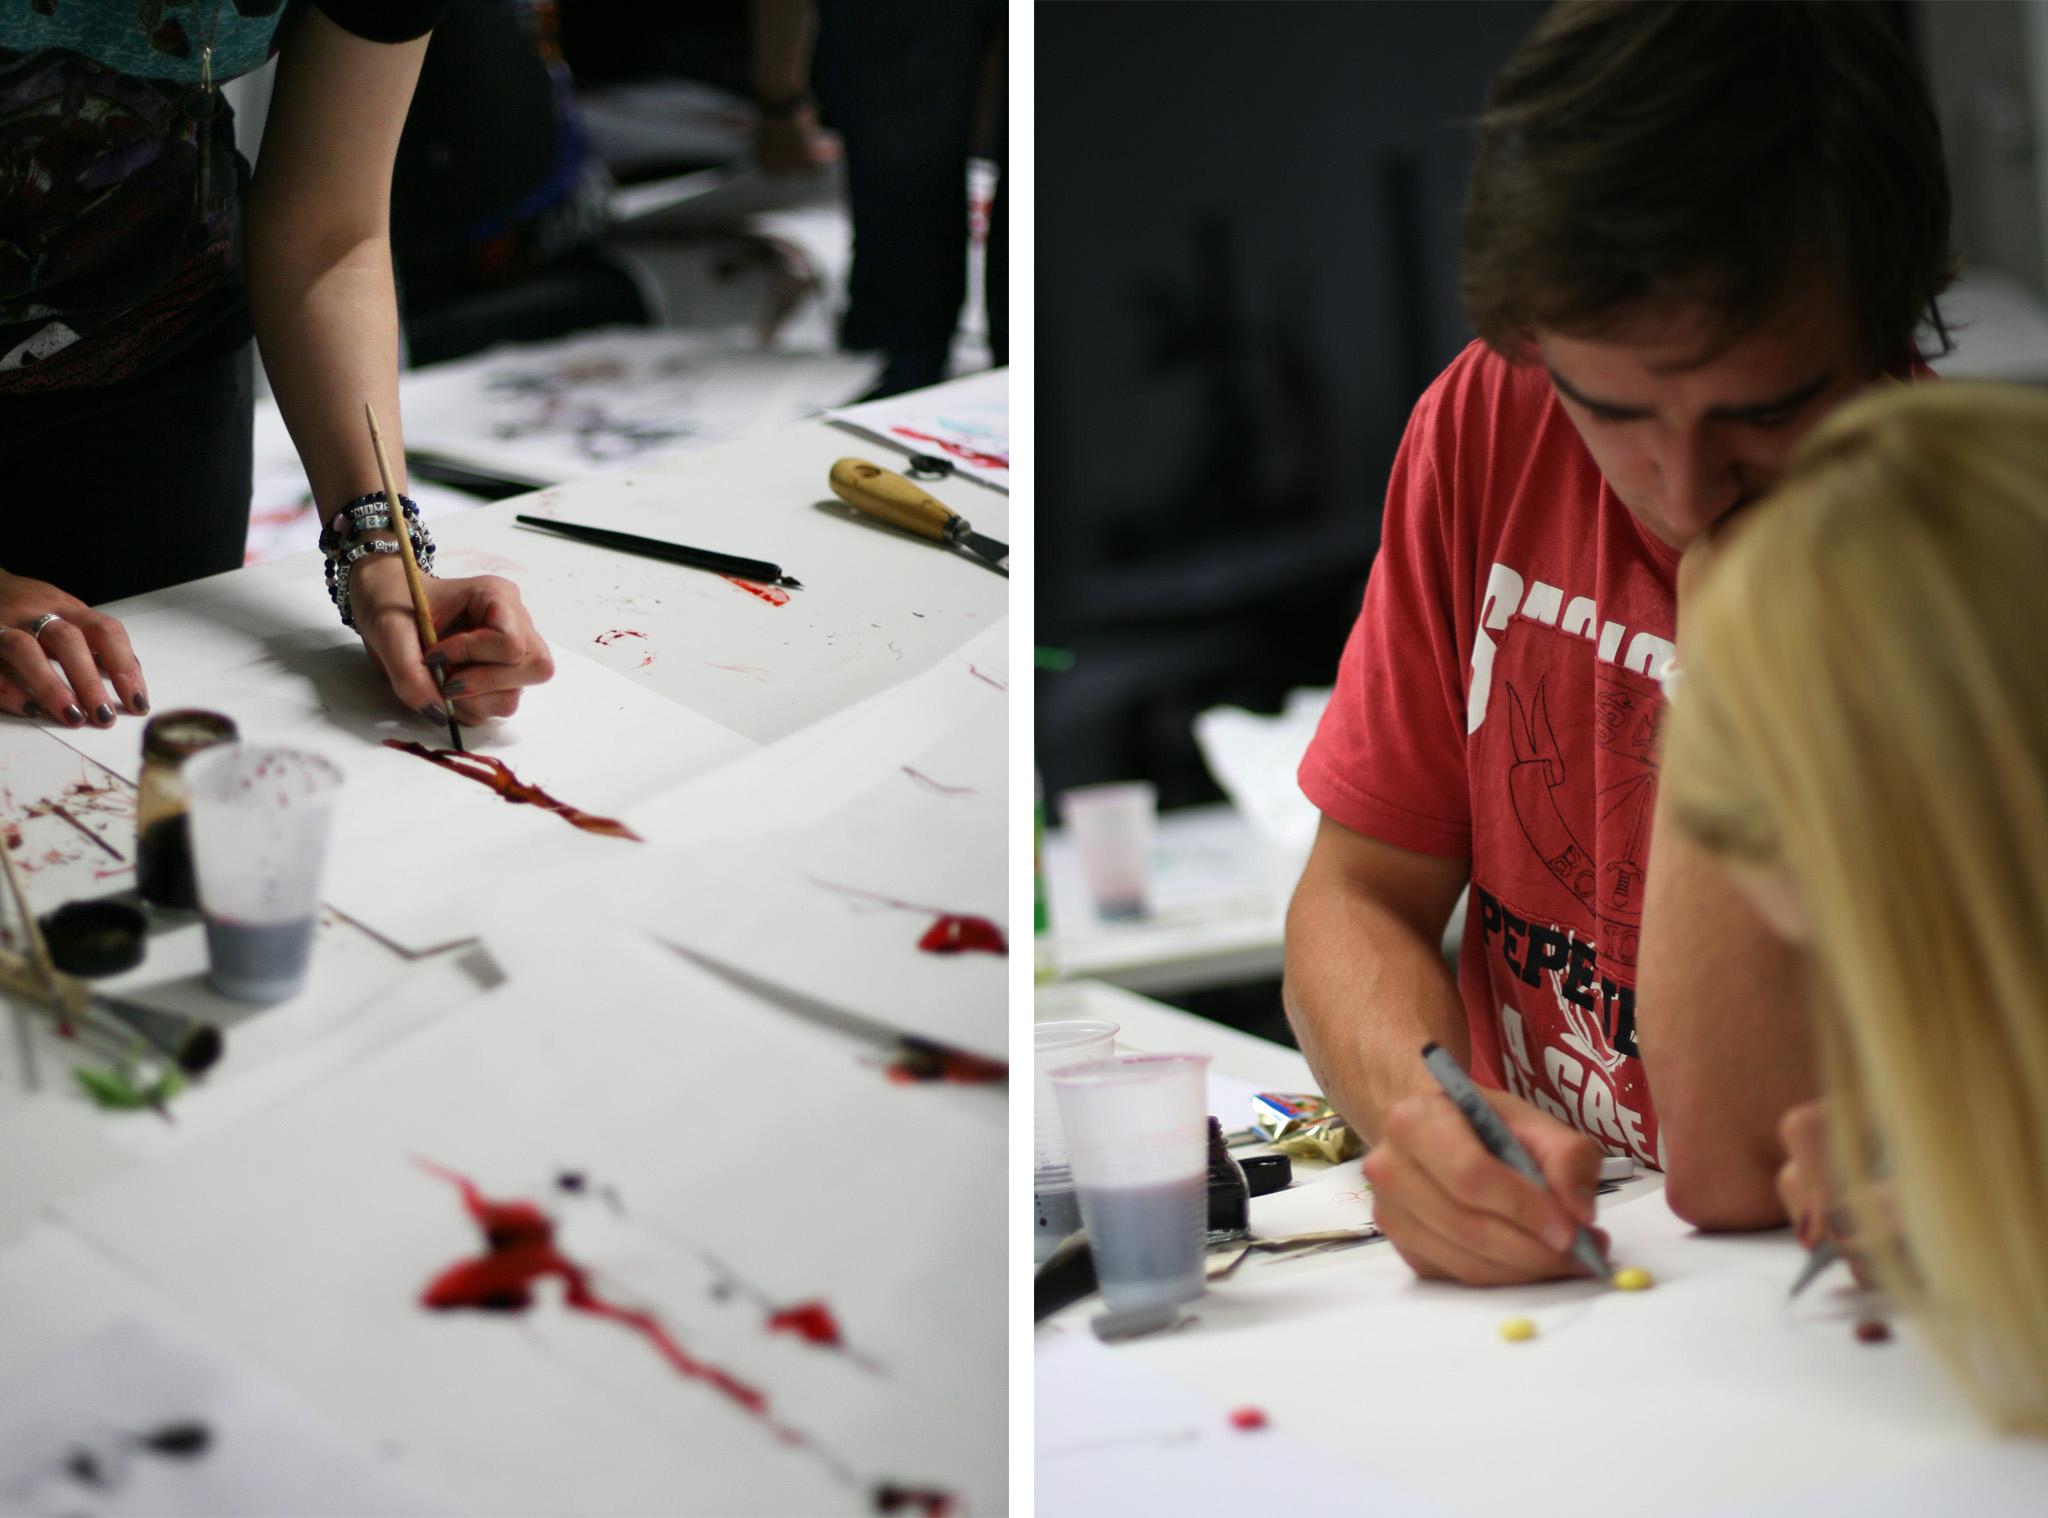 hannah-rauss-workshop-freie-kalligraphie-noe-io06